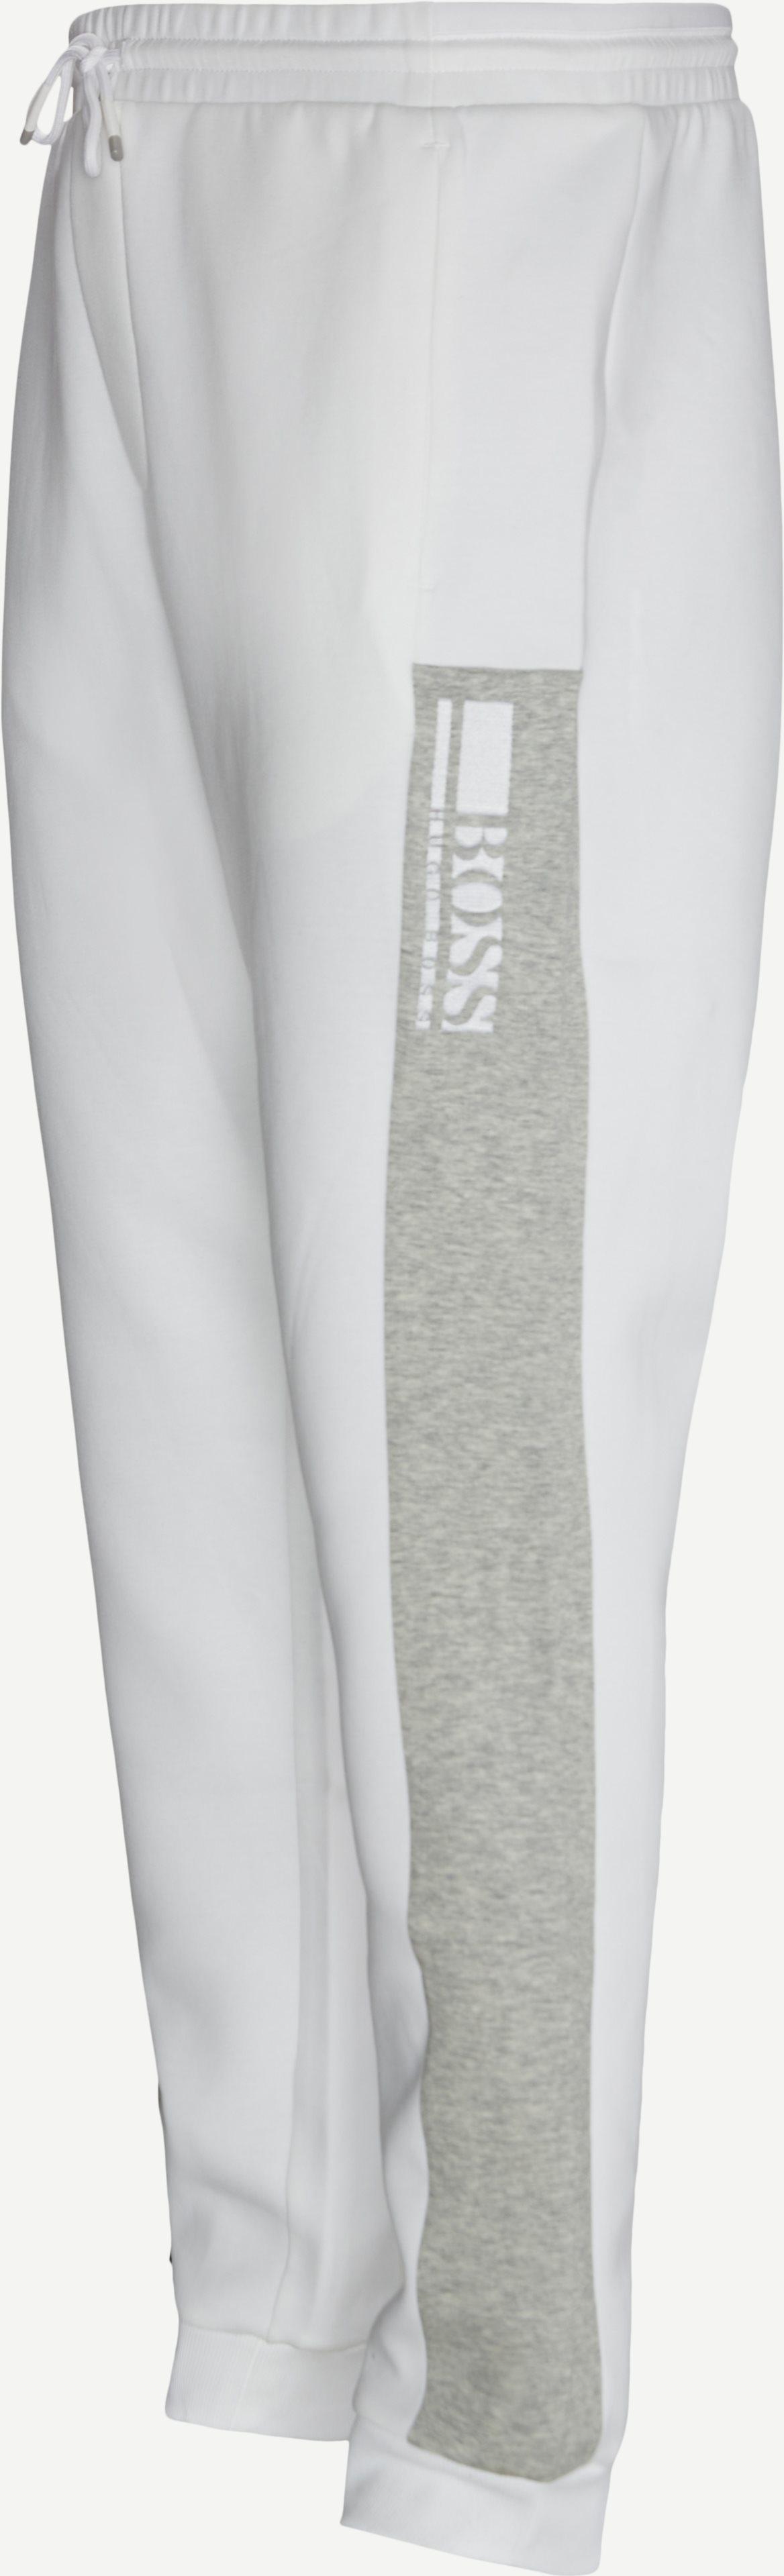 Byxor - Regular fit - Vit